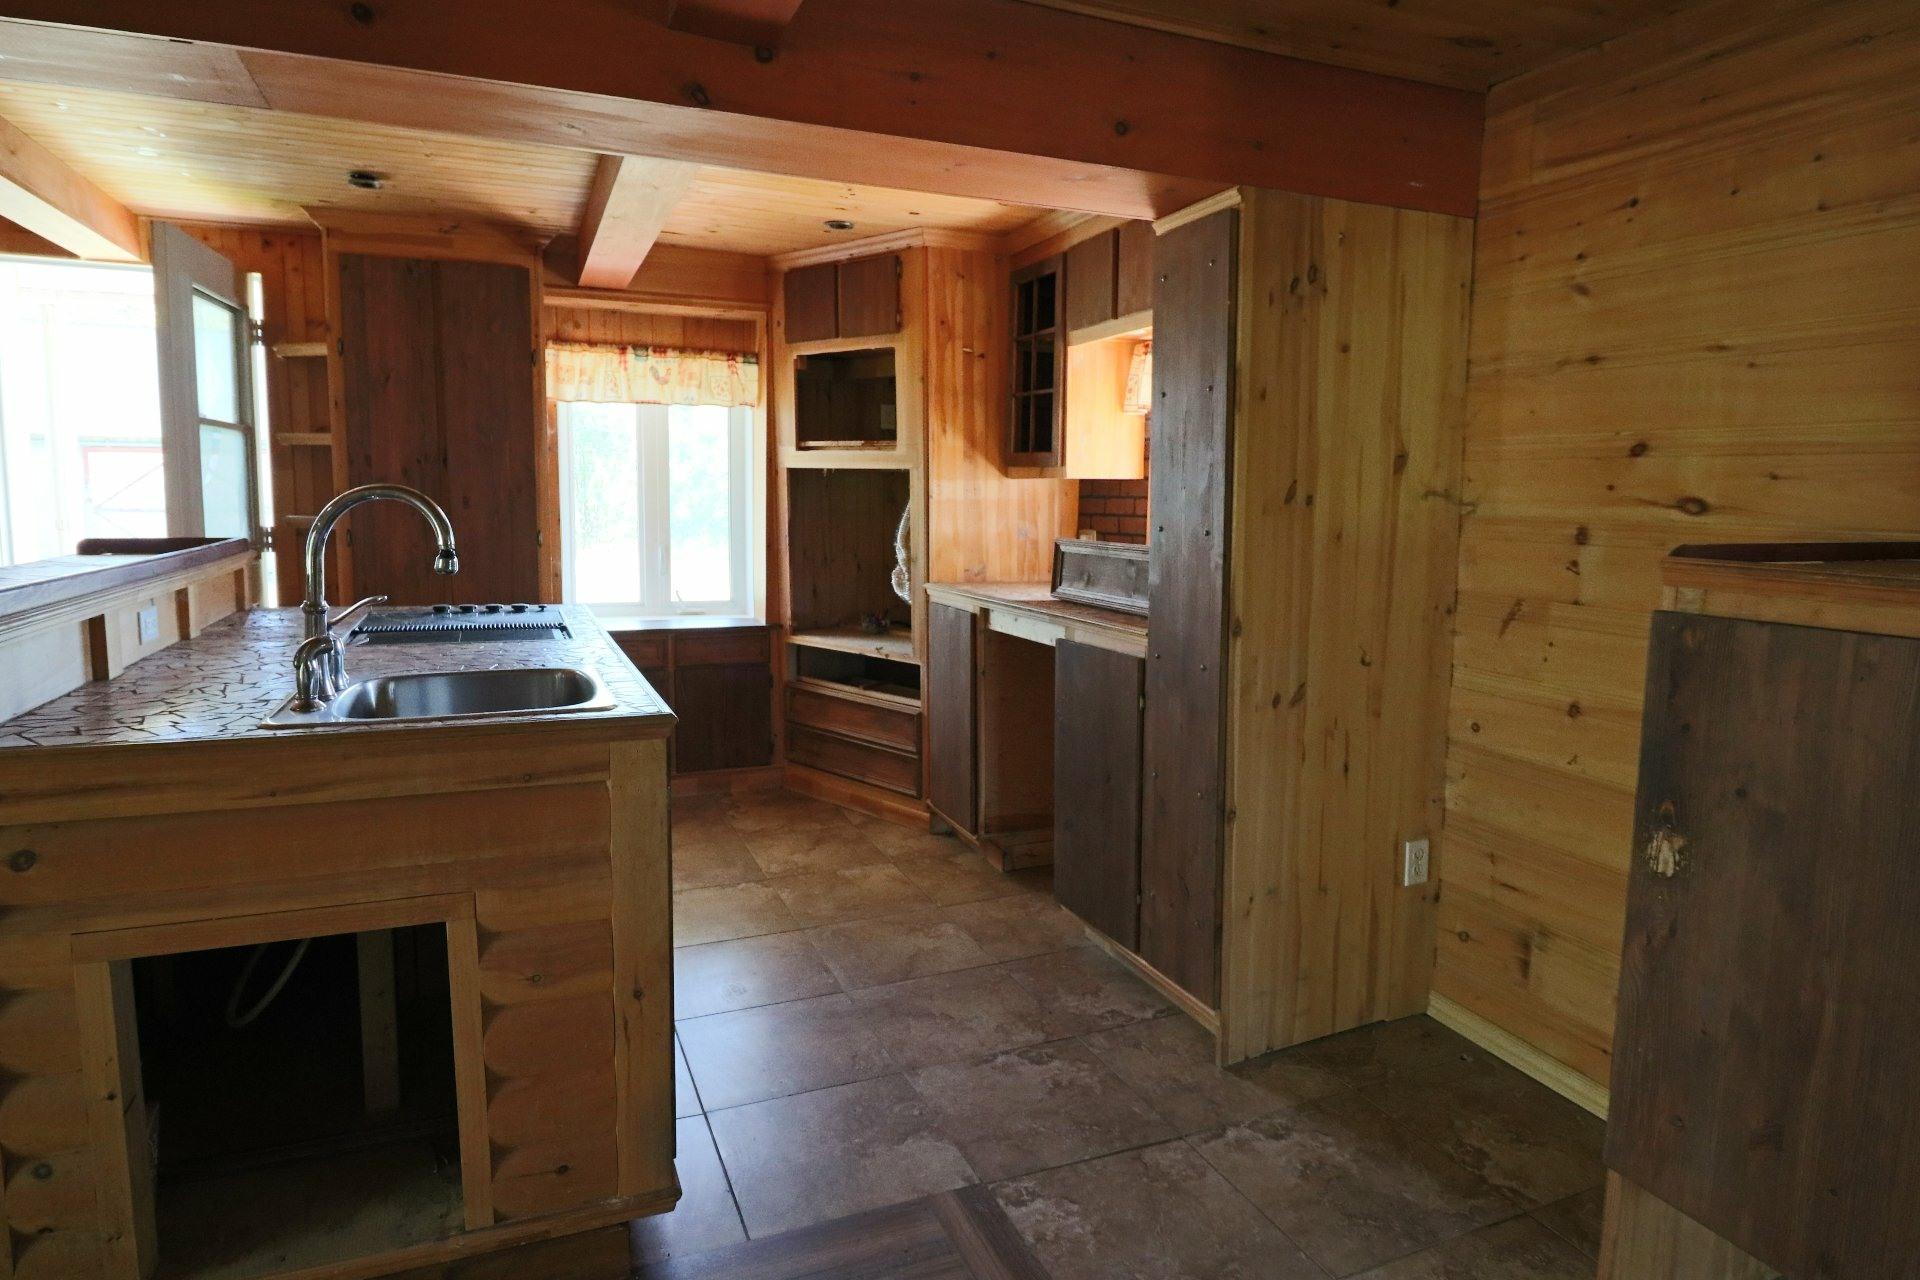 image 5 - House For sale Saint-Tite - 7 rooms